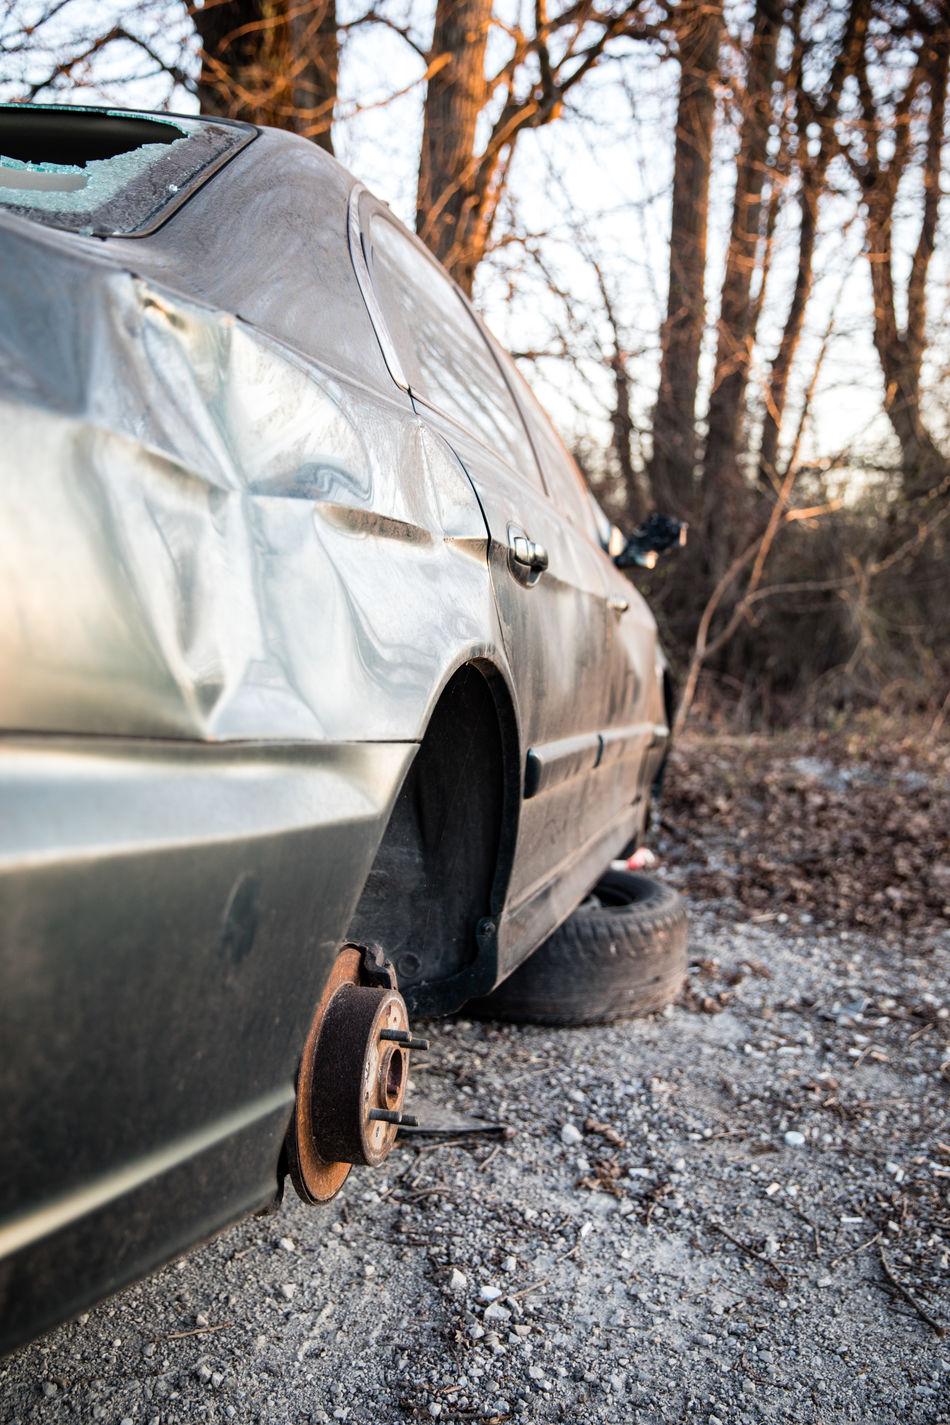 Abandoned Abandoned & Derelict Broken Broken Car Broken Down Broken Down Car Broken Glass Car Cracked Mangled Vandalism Vandalized Wheel Well